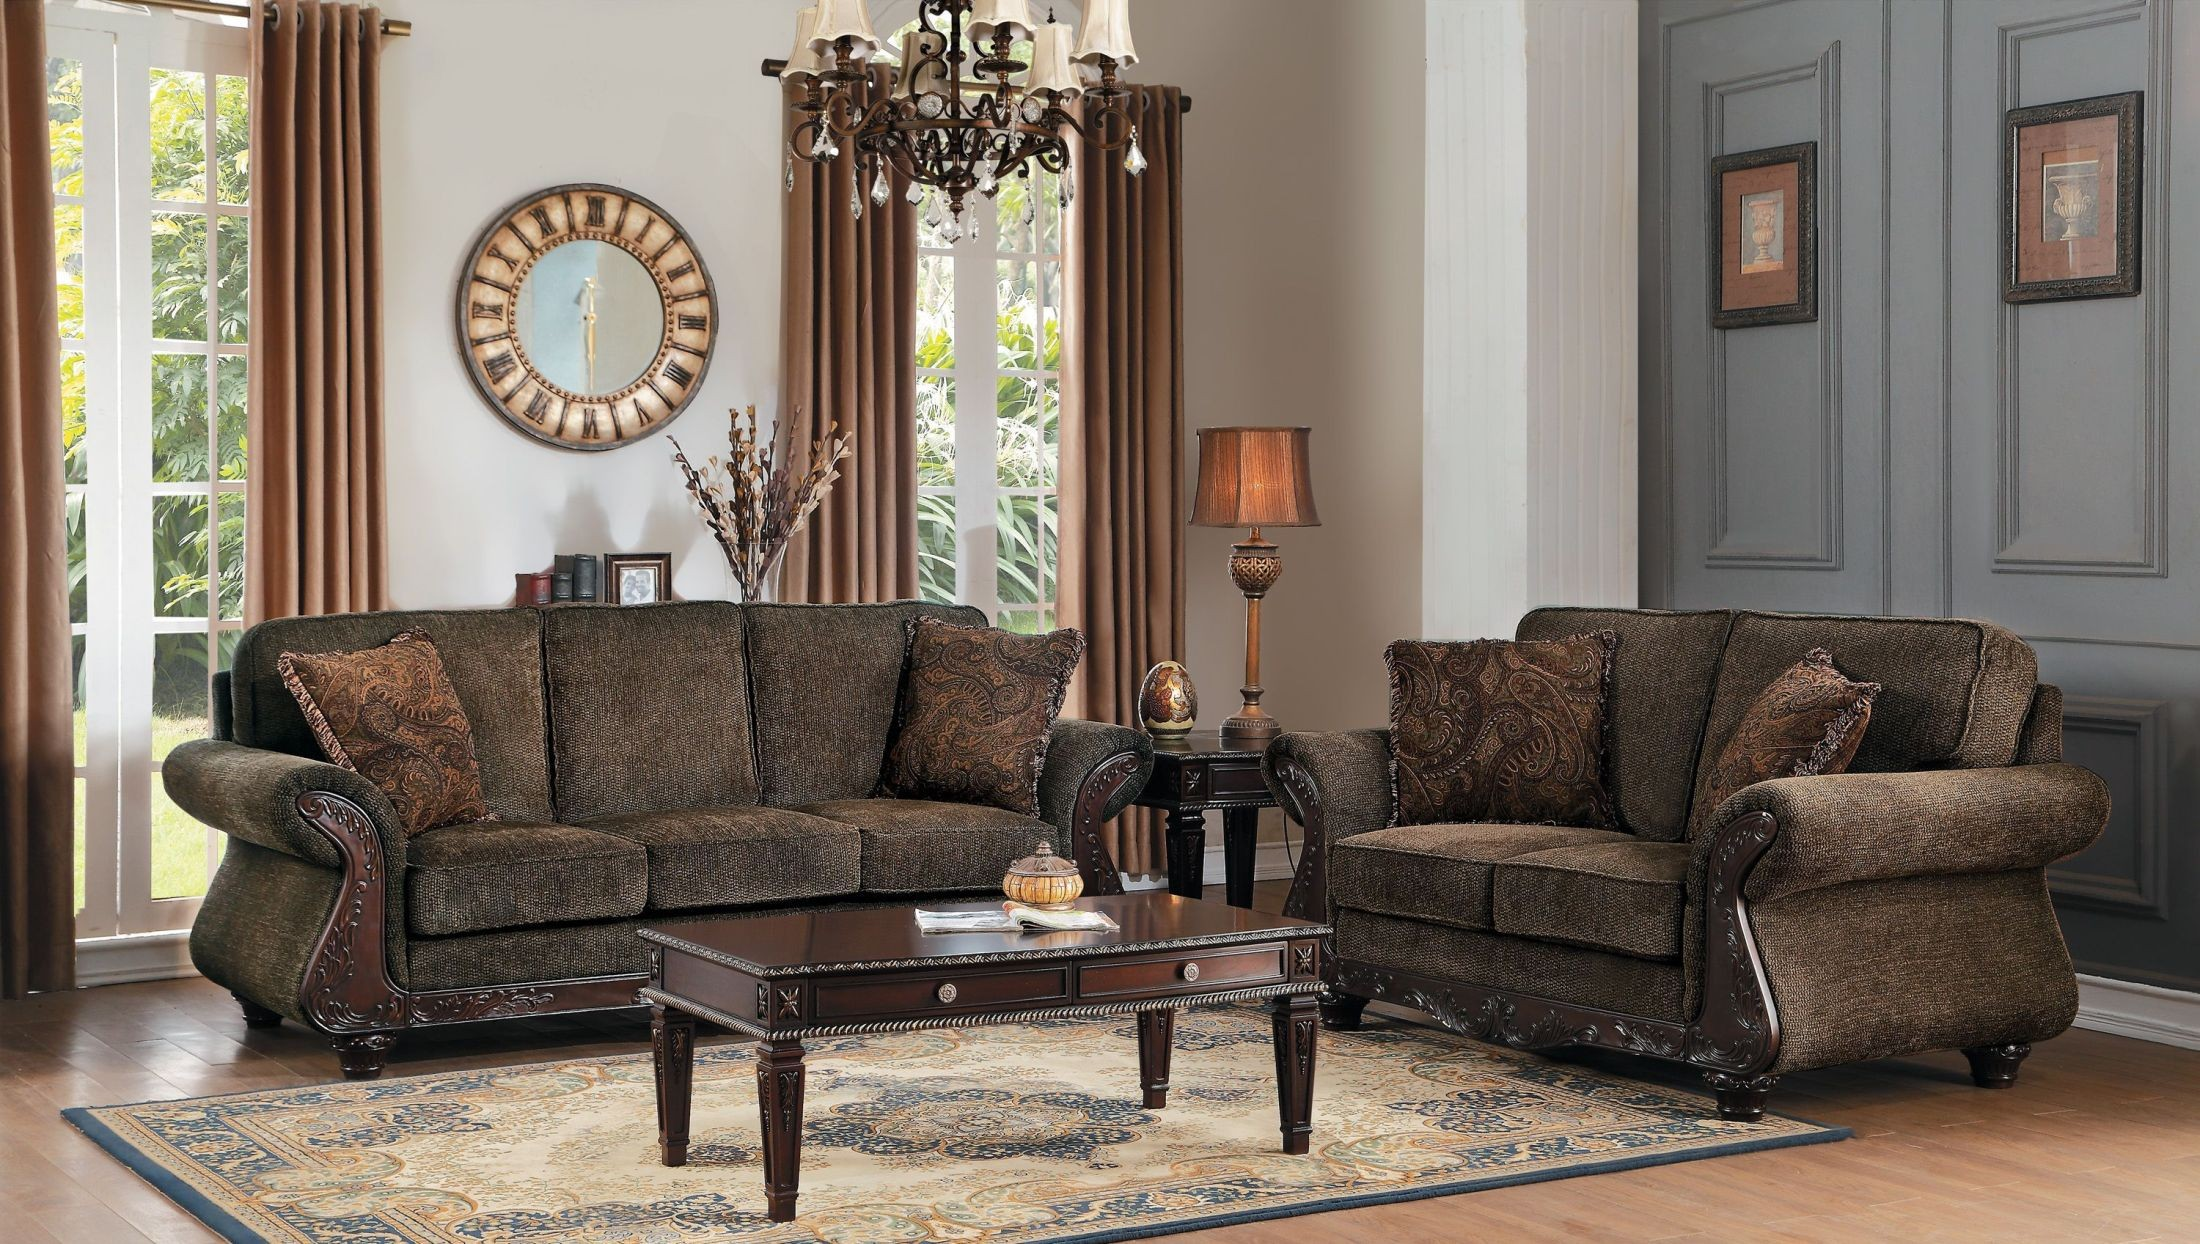 Mandeville Brown Chenille Living Room Set from Homelegance ...